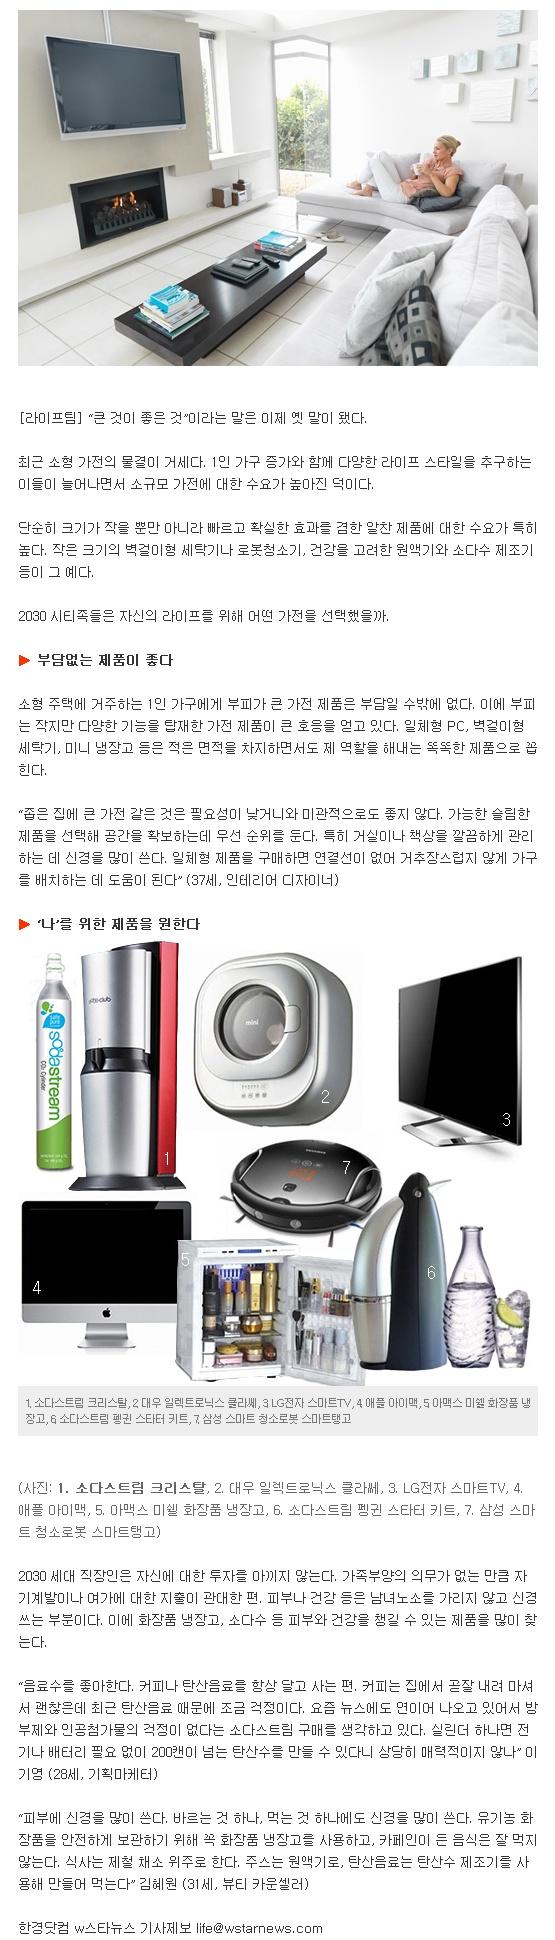 hankyung_com_20131205_120711.jpg